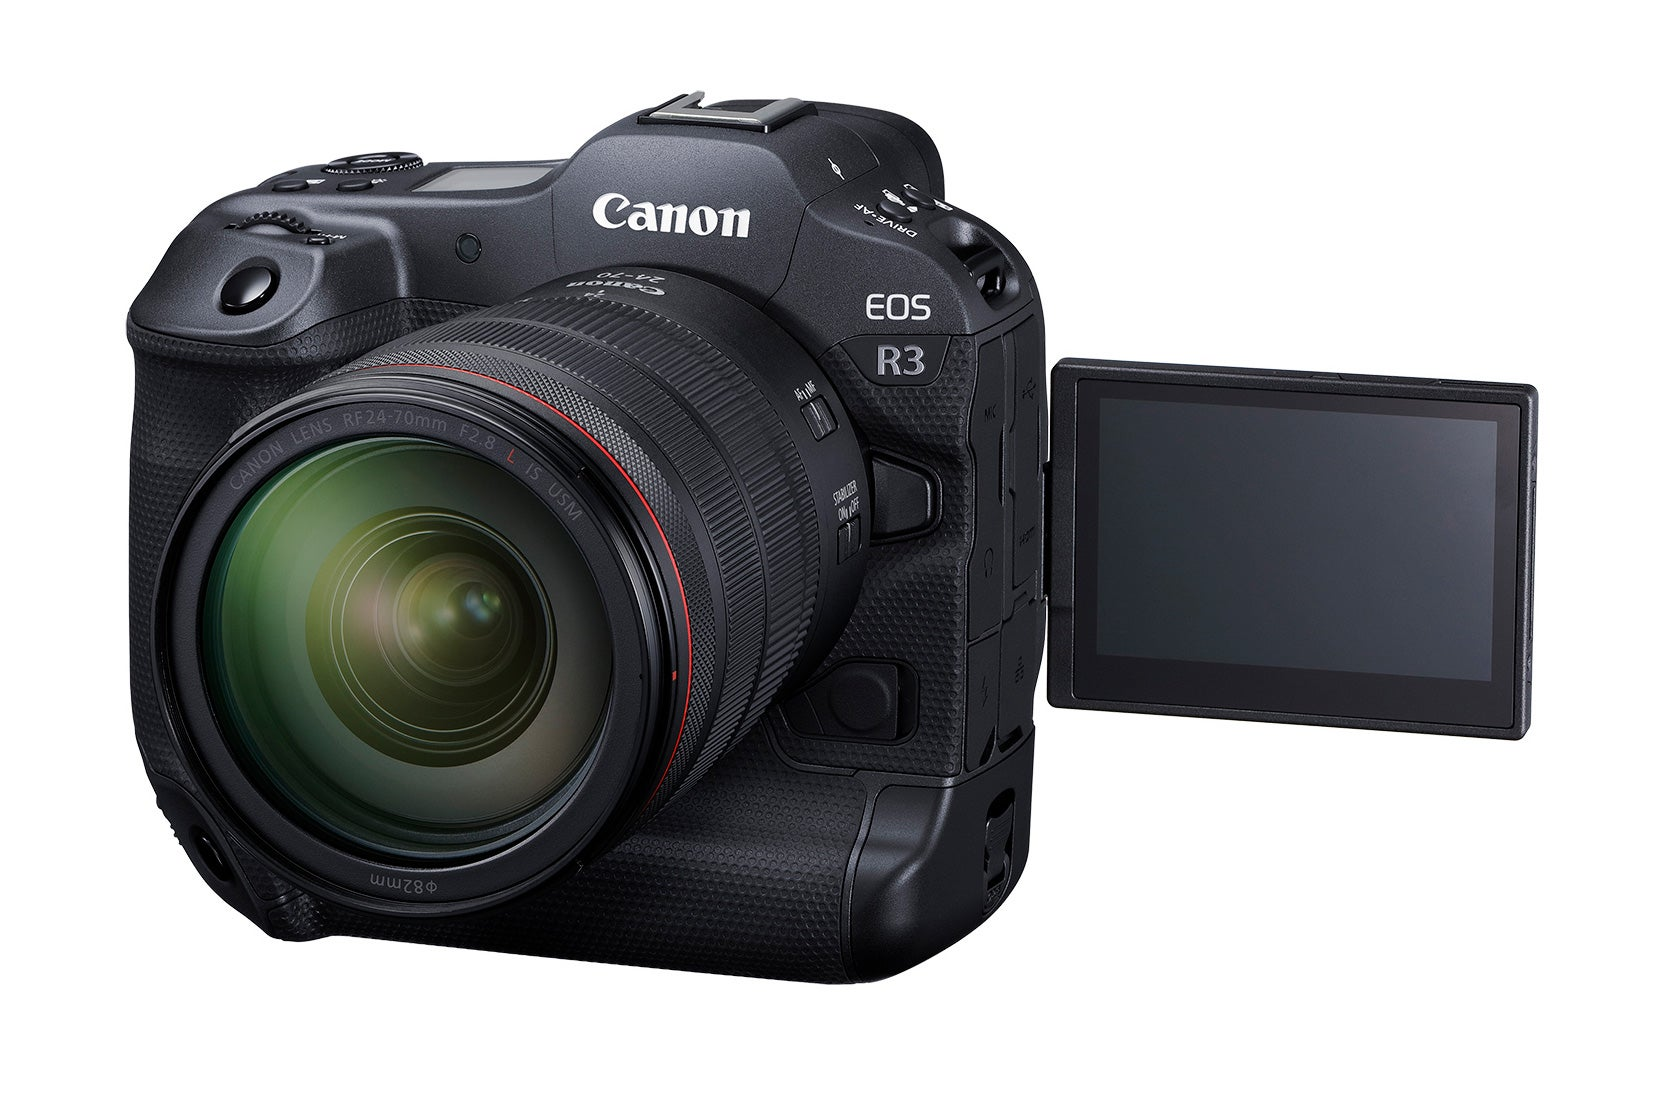 Canon EOS R3 mirrorless camera rotating screen